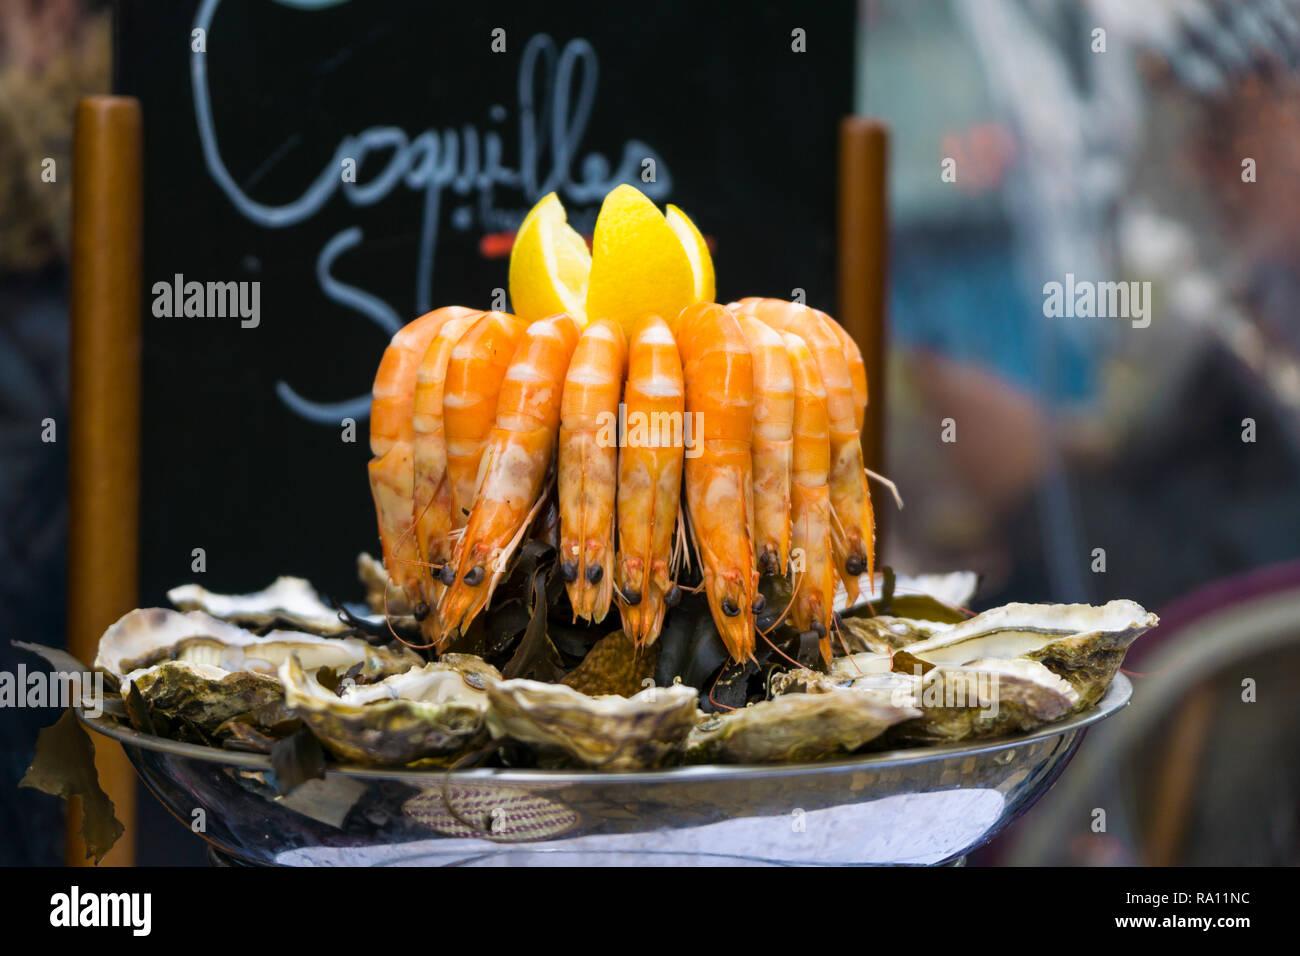 Paris Food - Stock Image